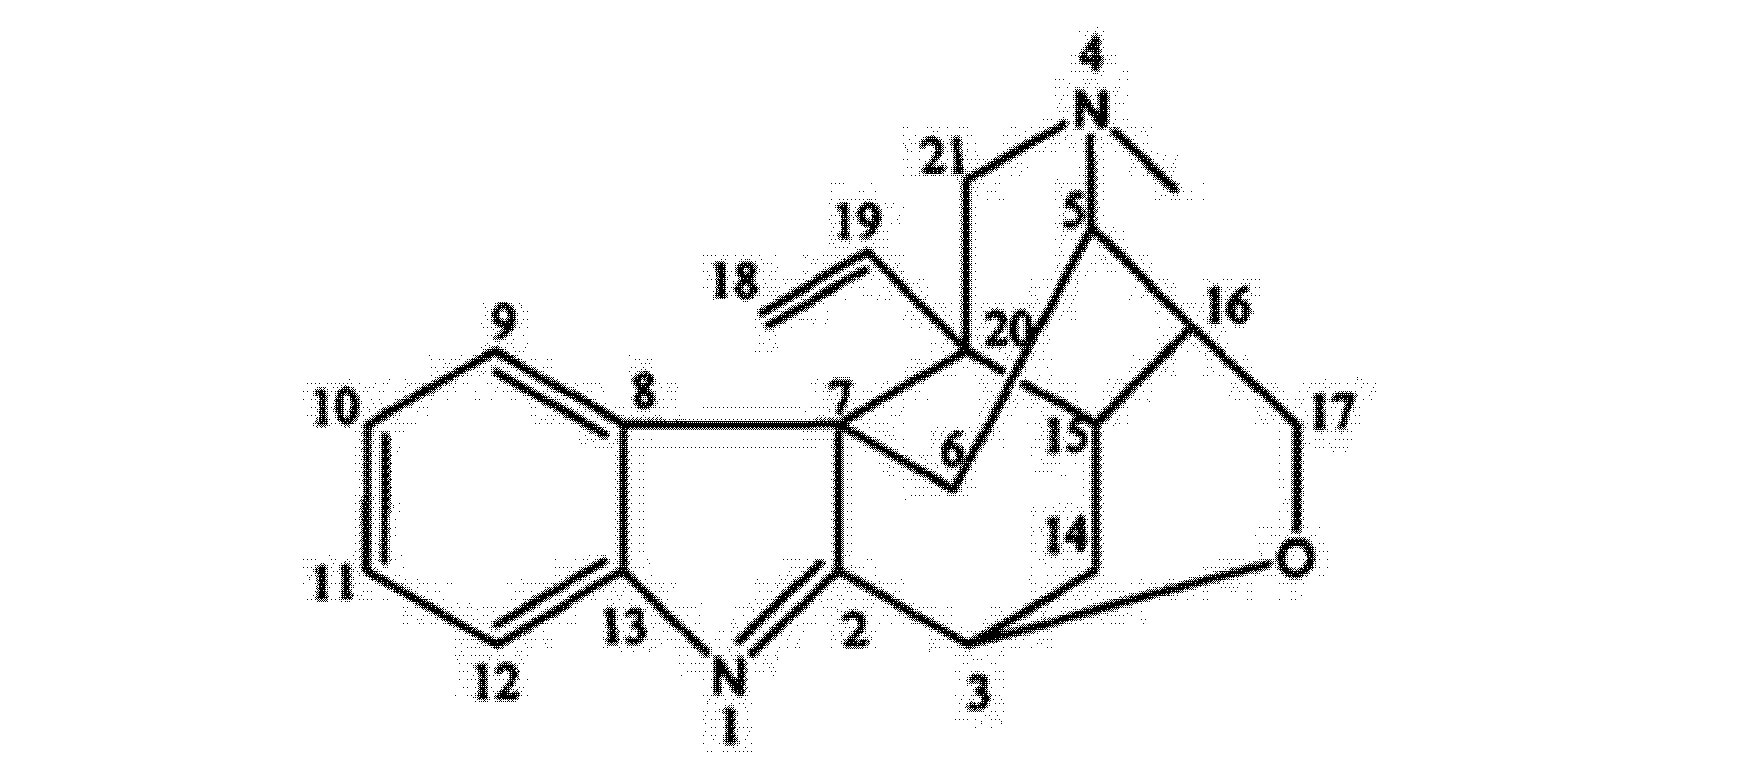 分子式为c2tlh22n2o